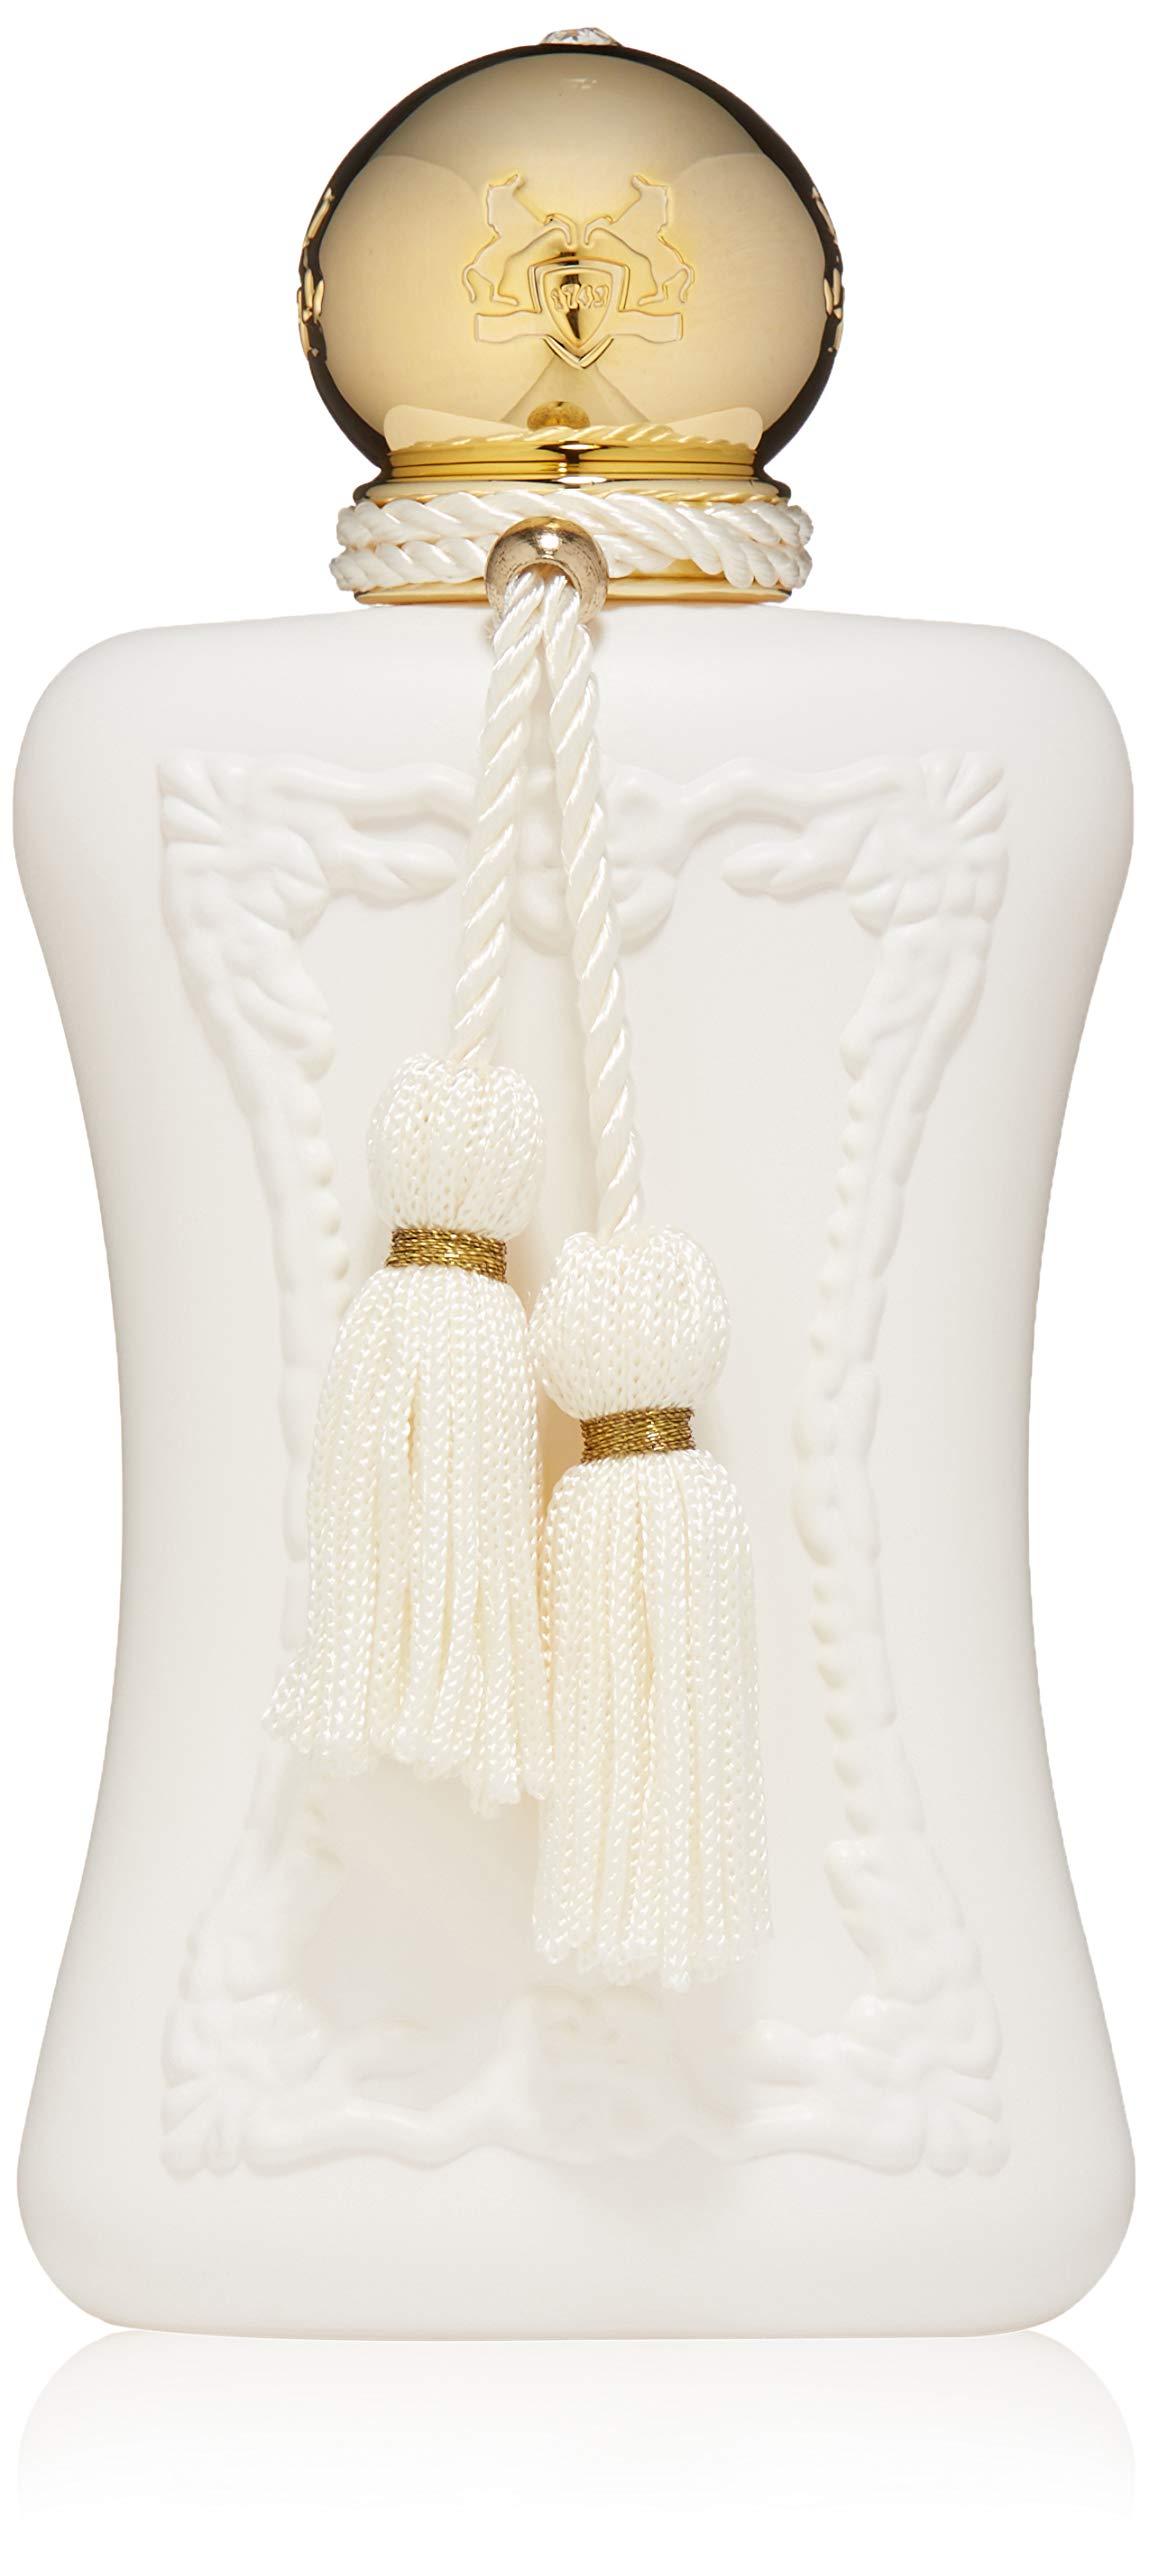 PARFUMS de MARLY Sedbury Royal Essence Eau De Parfum For Women, 75 ml